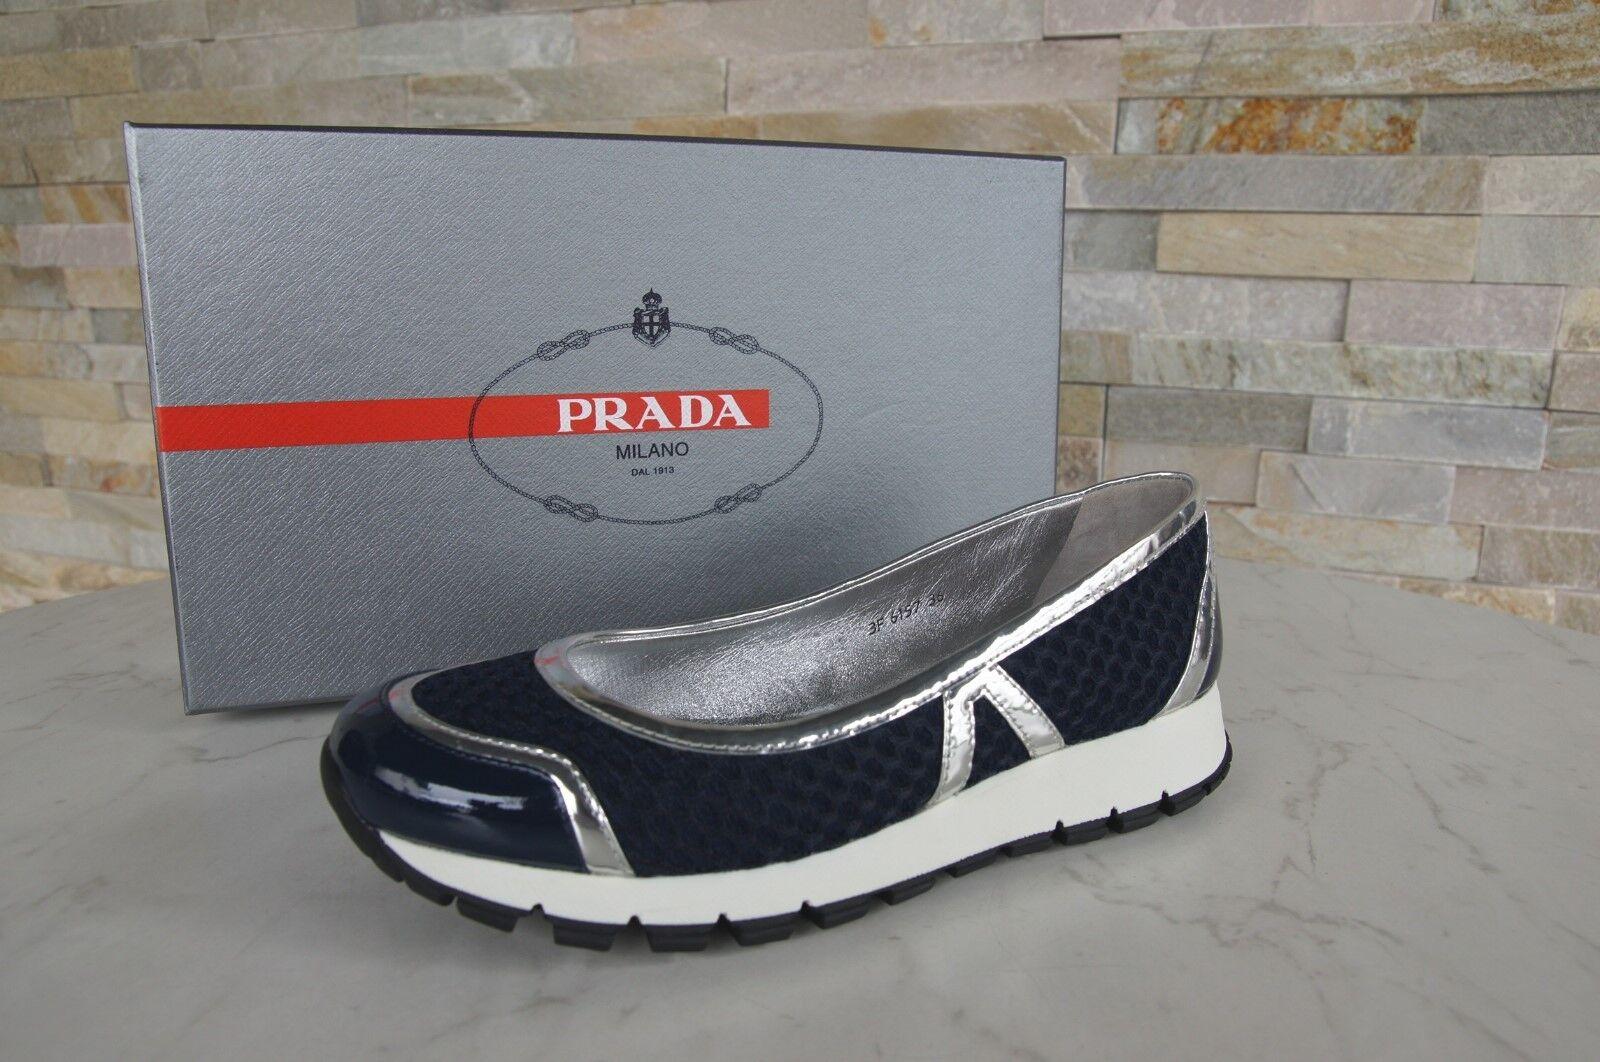 PRADA TAGLIA 38,5 Ballerine slipper scarpe  Argento vernice Bee  scarpe  62b692